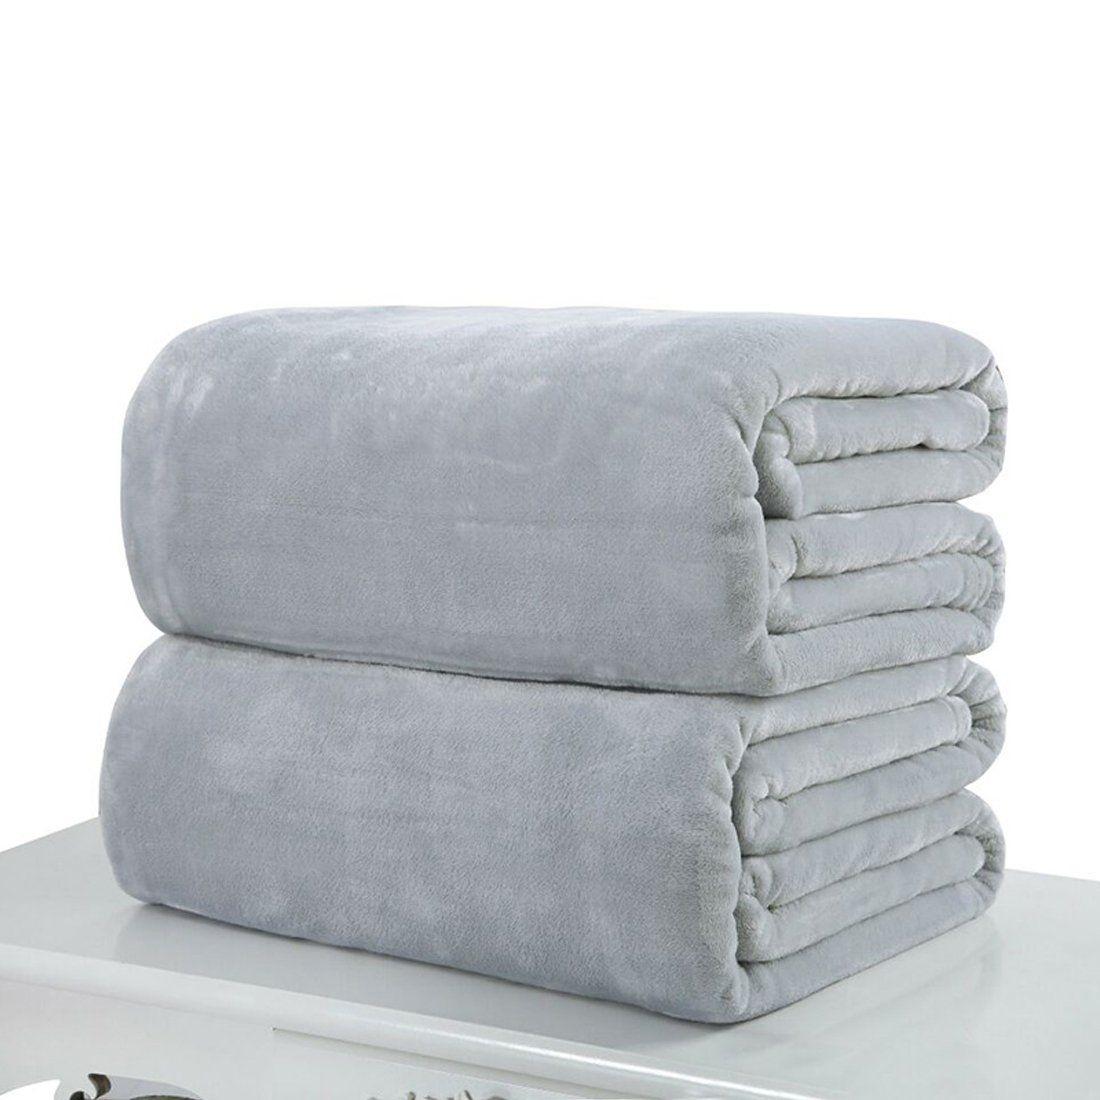 Flannel fleece blanket  Useful High Quality Super Soft Flannel Plain Bedspread Blanket